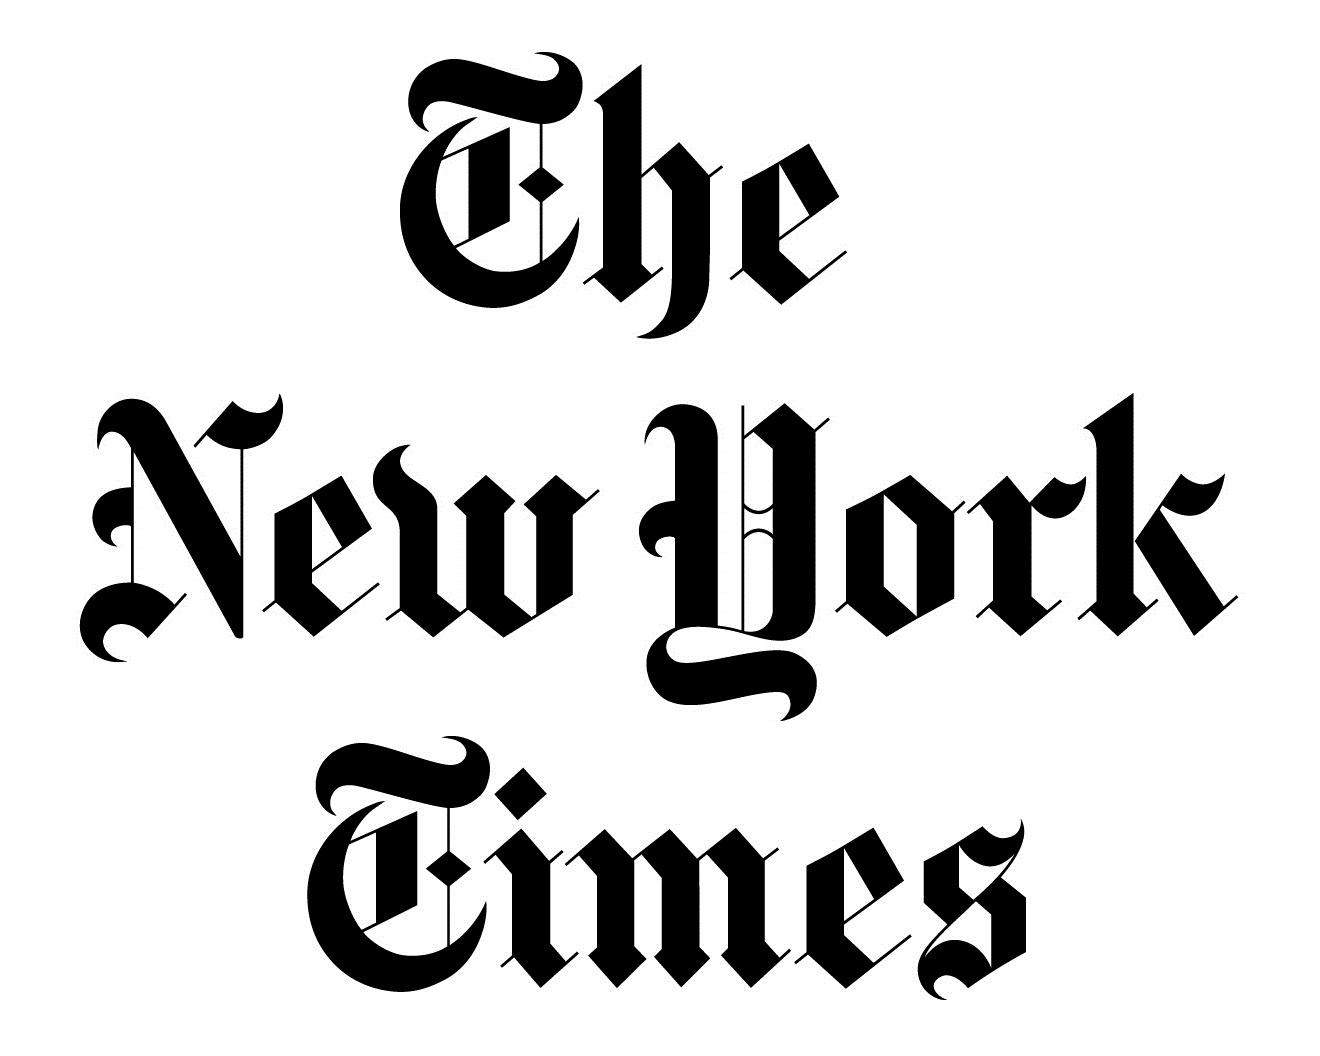 New_York_Times_logo_variation